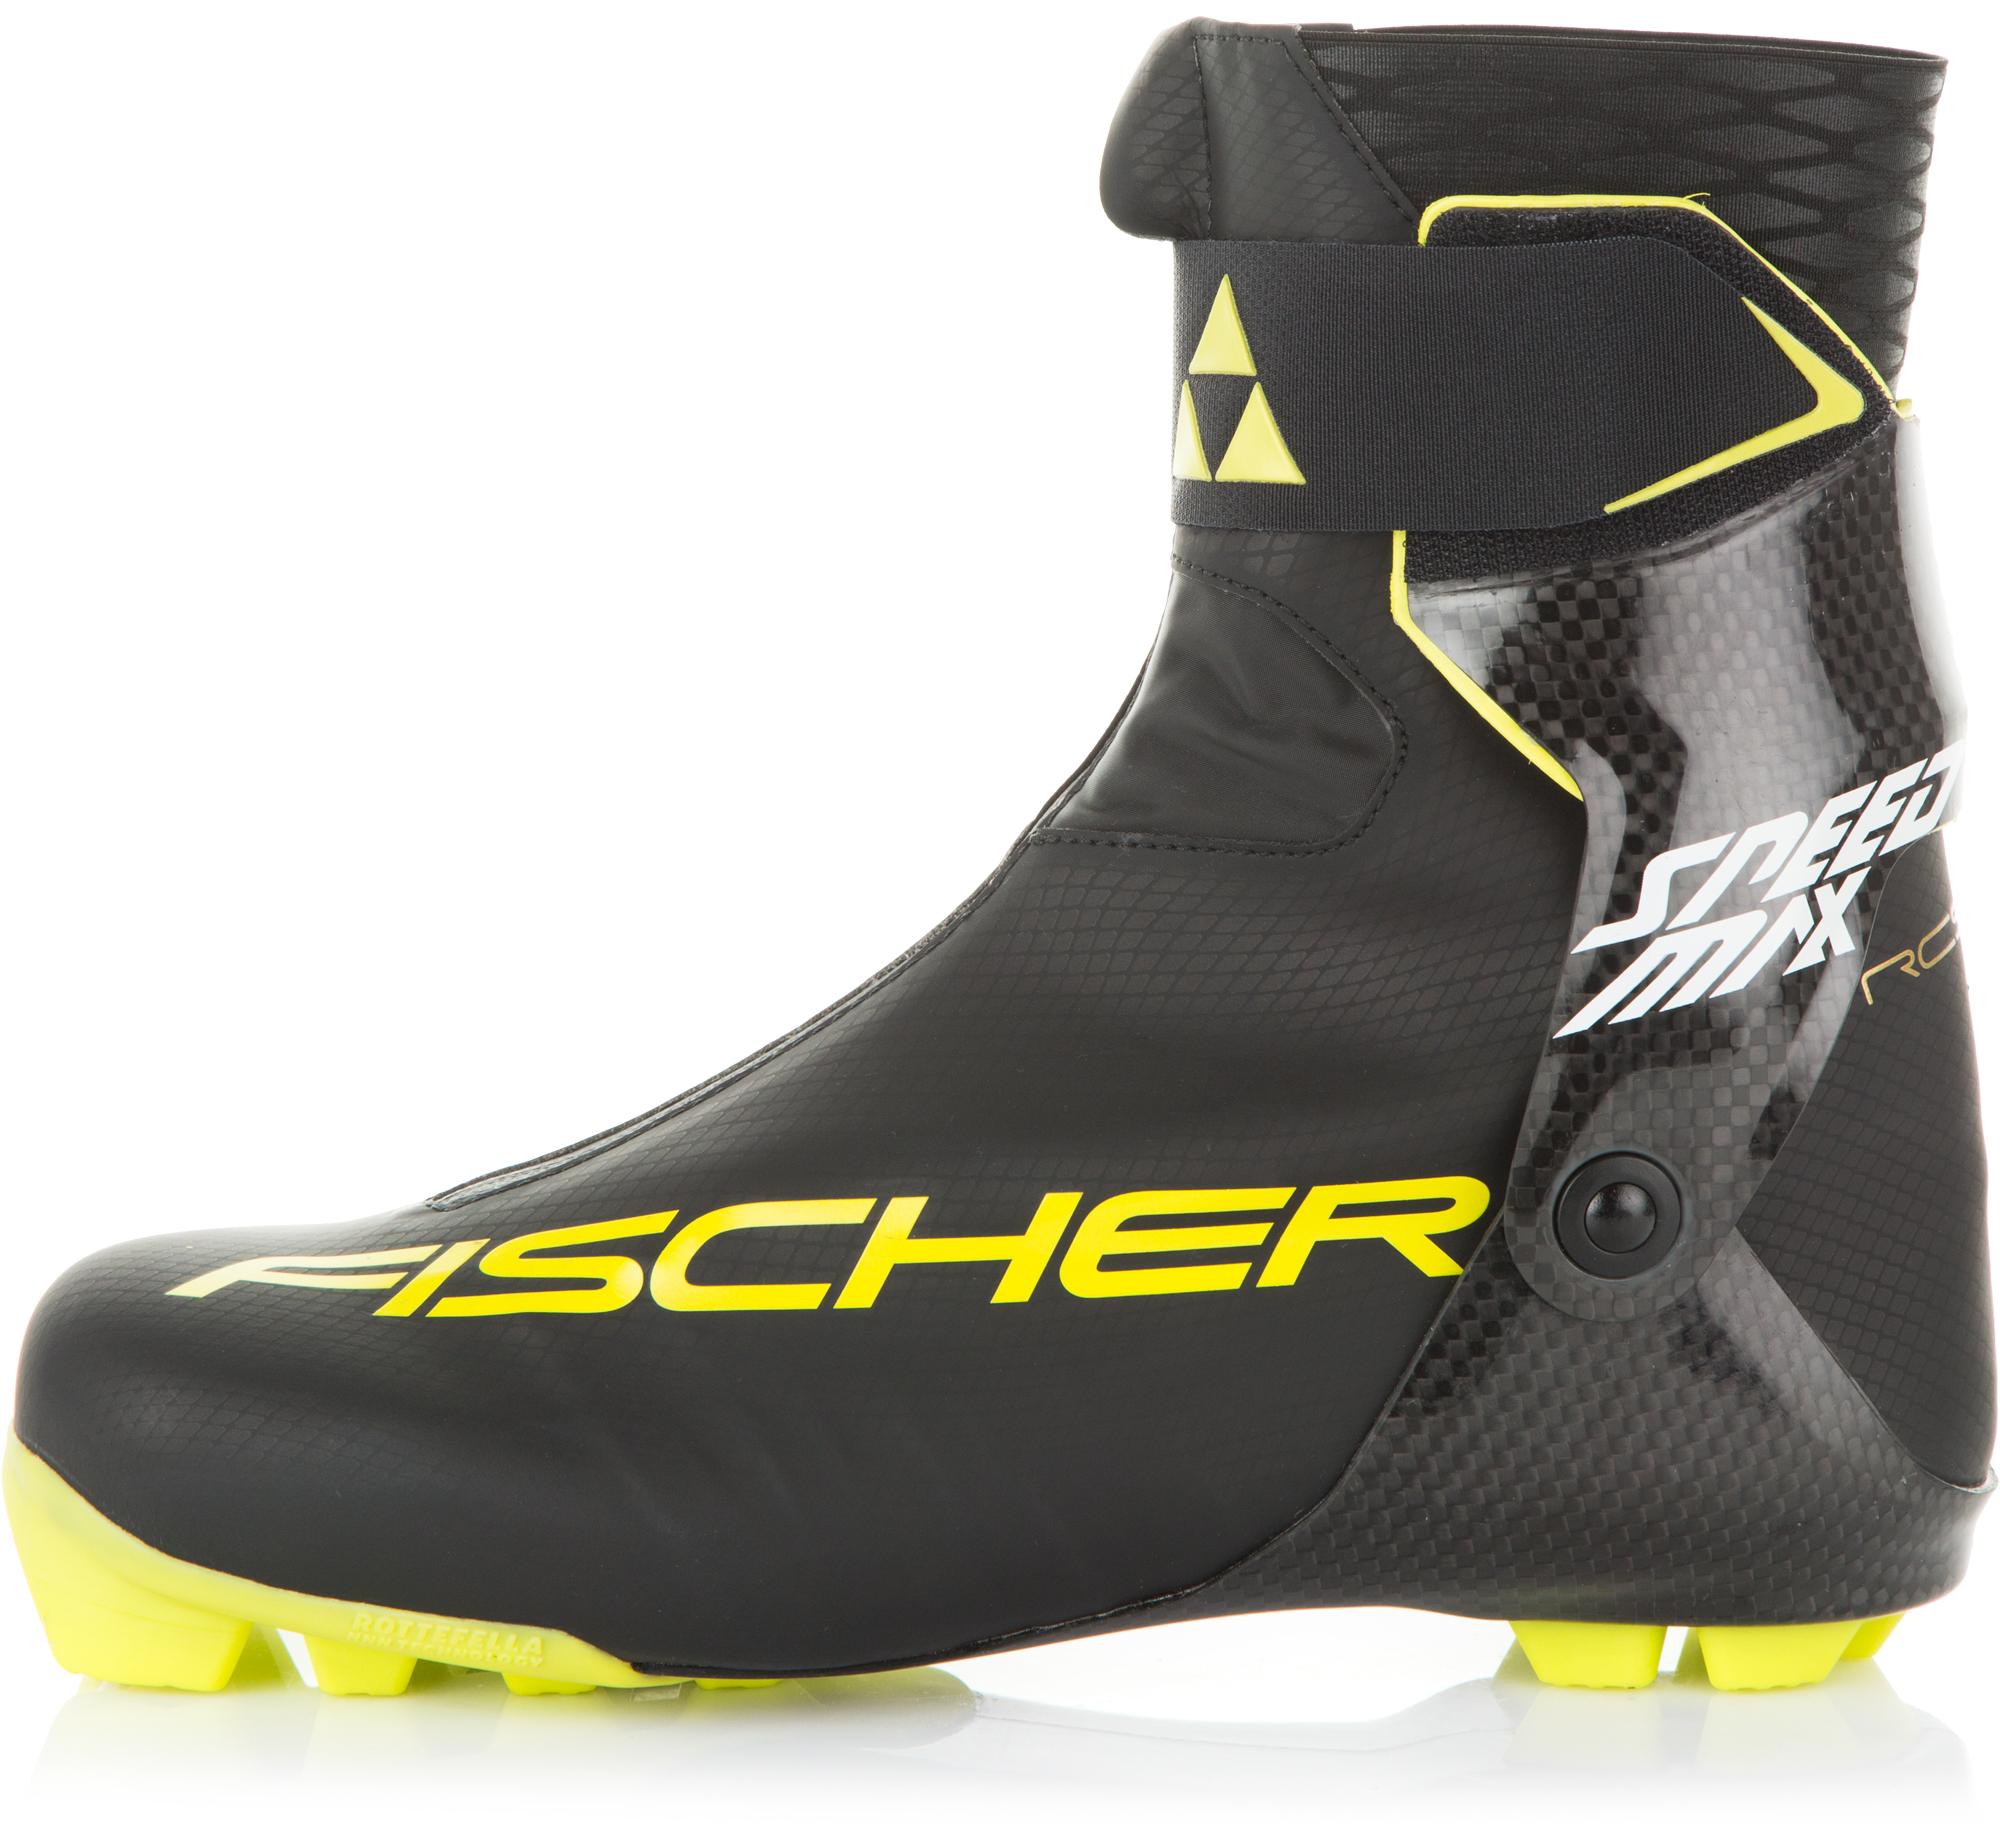 Fischer Ботинки для беговых лыж Fischer Speedmax Skate Carbon, размер 46 цена